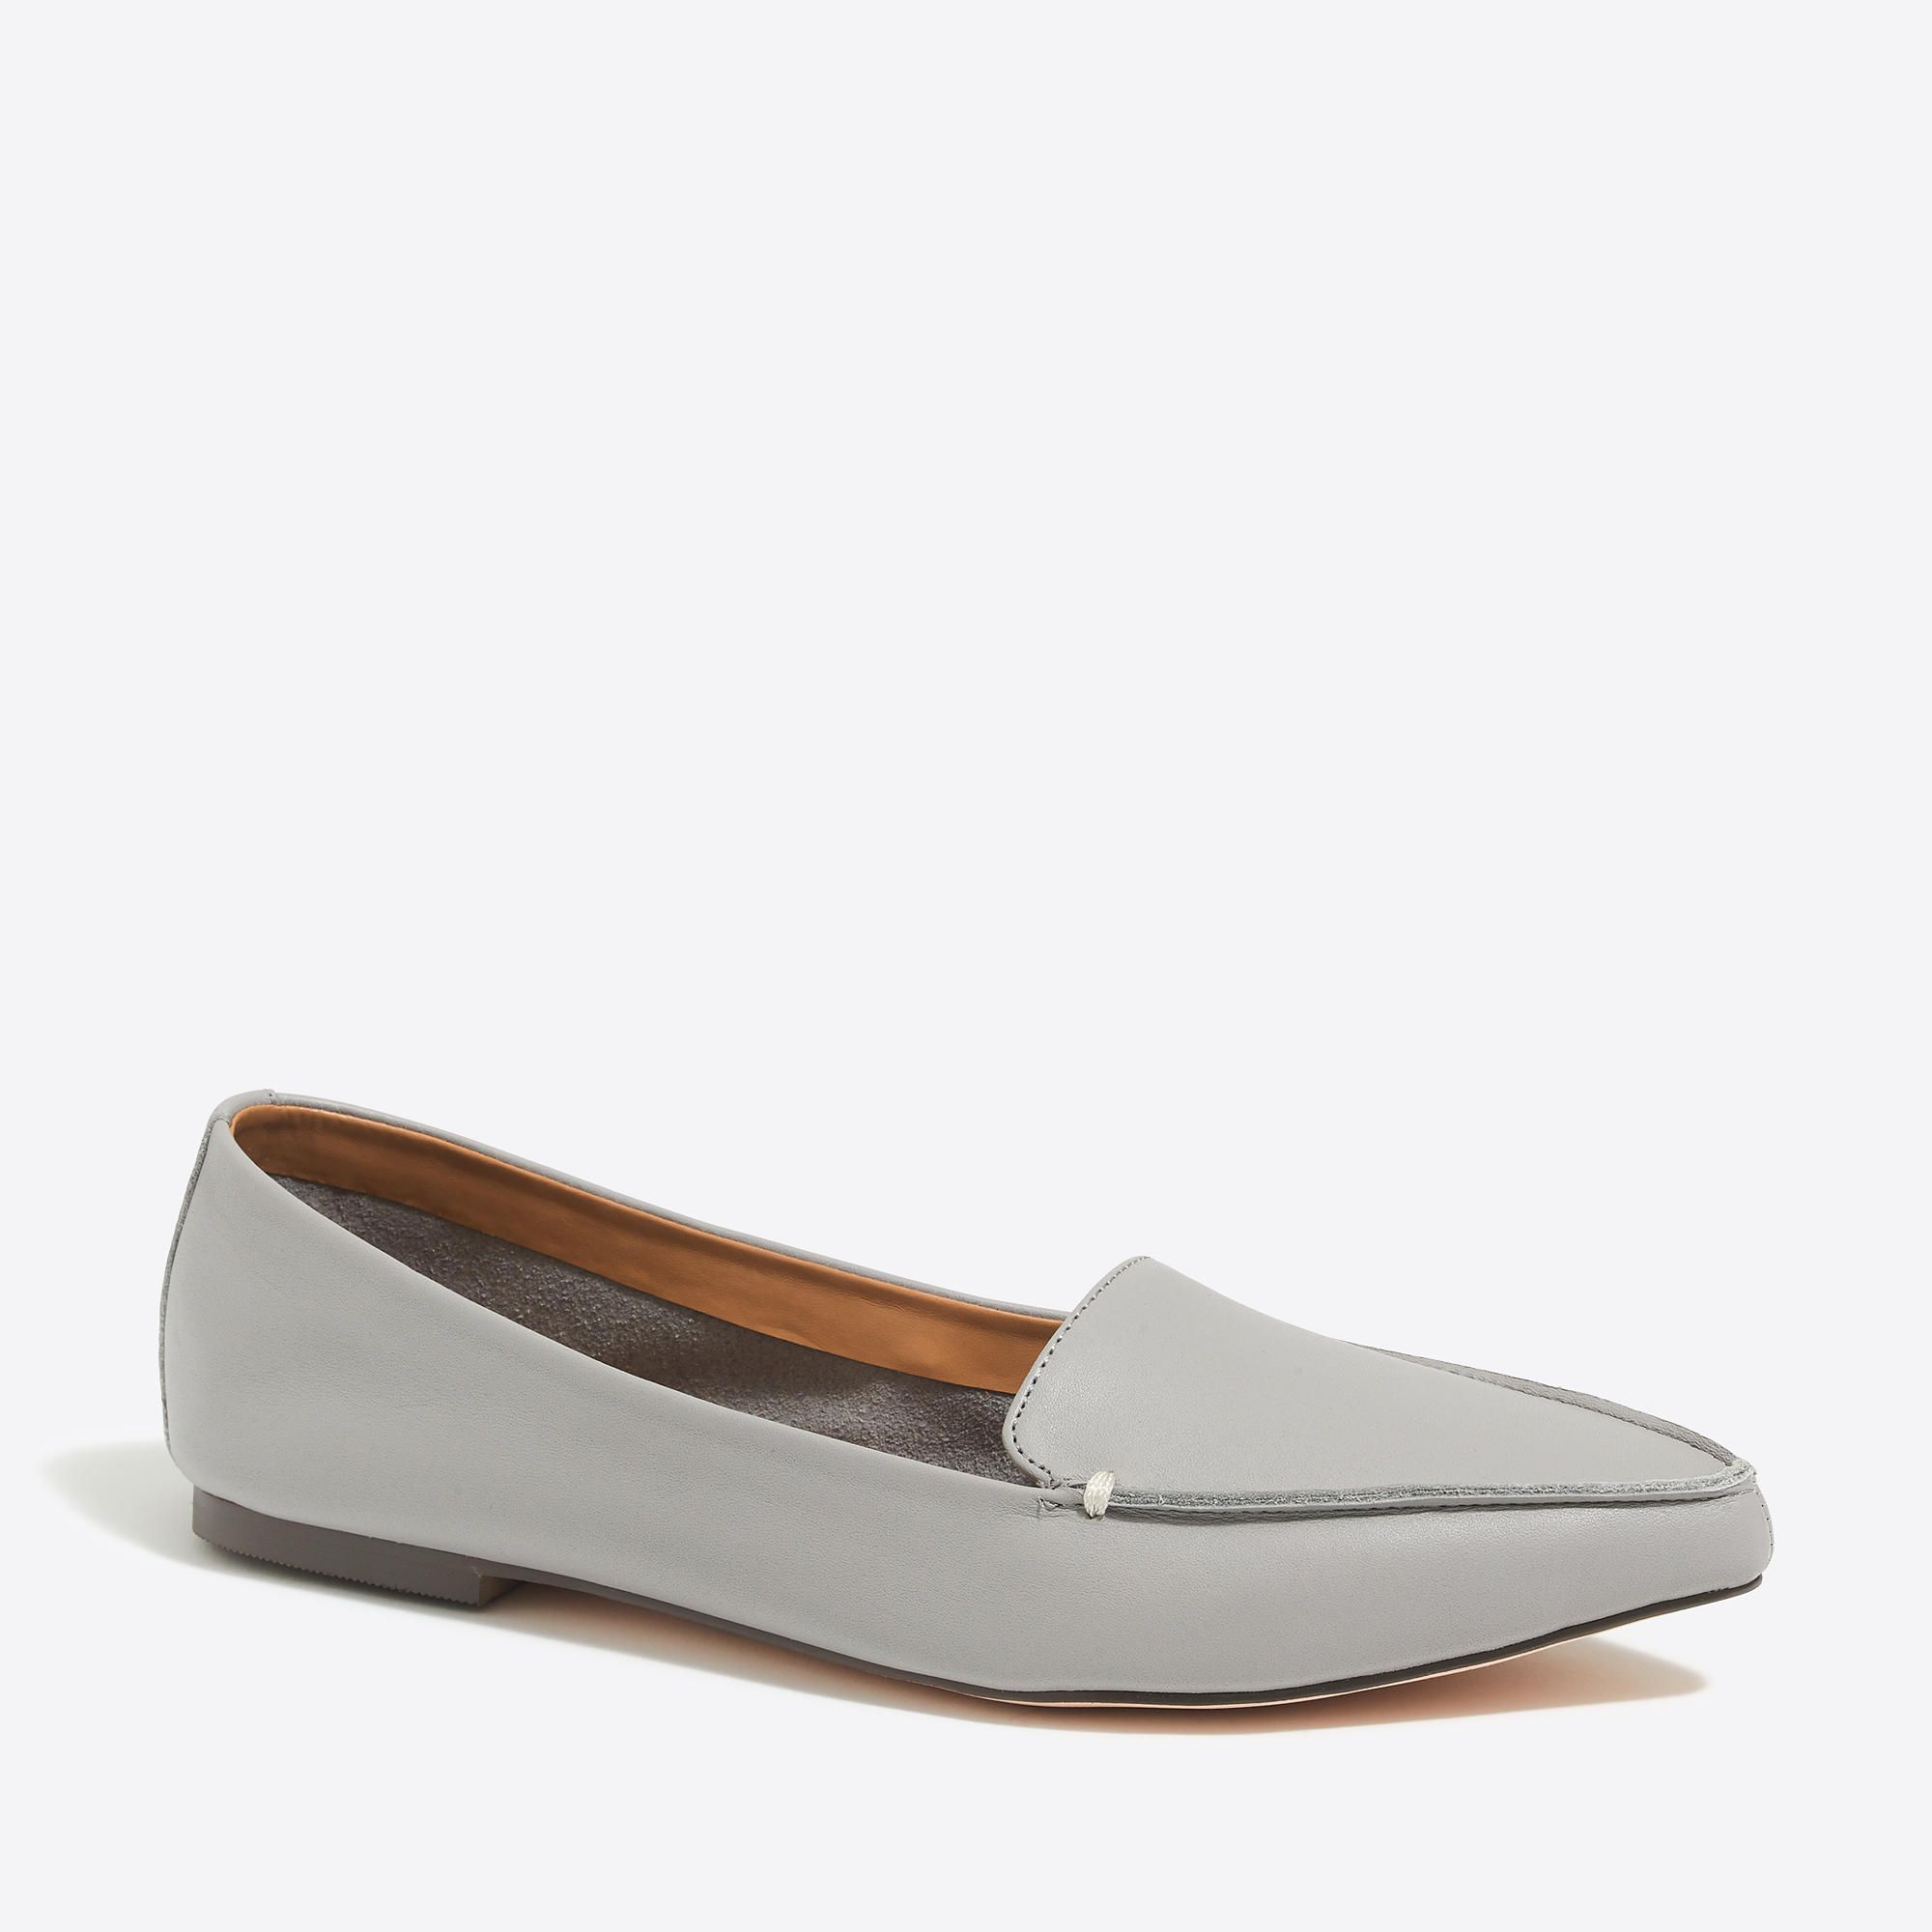 1ebbc04f7b3 Edie leather loafers - Women s Footwear